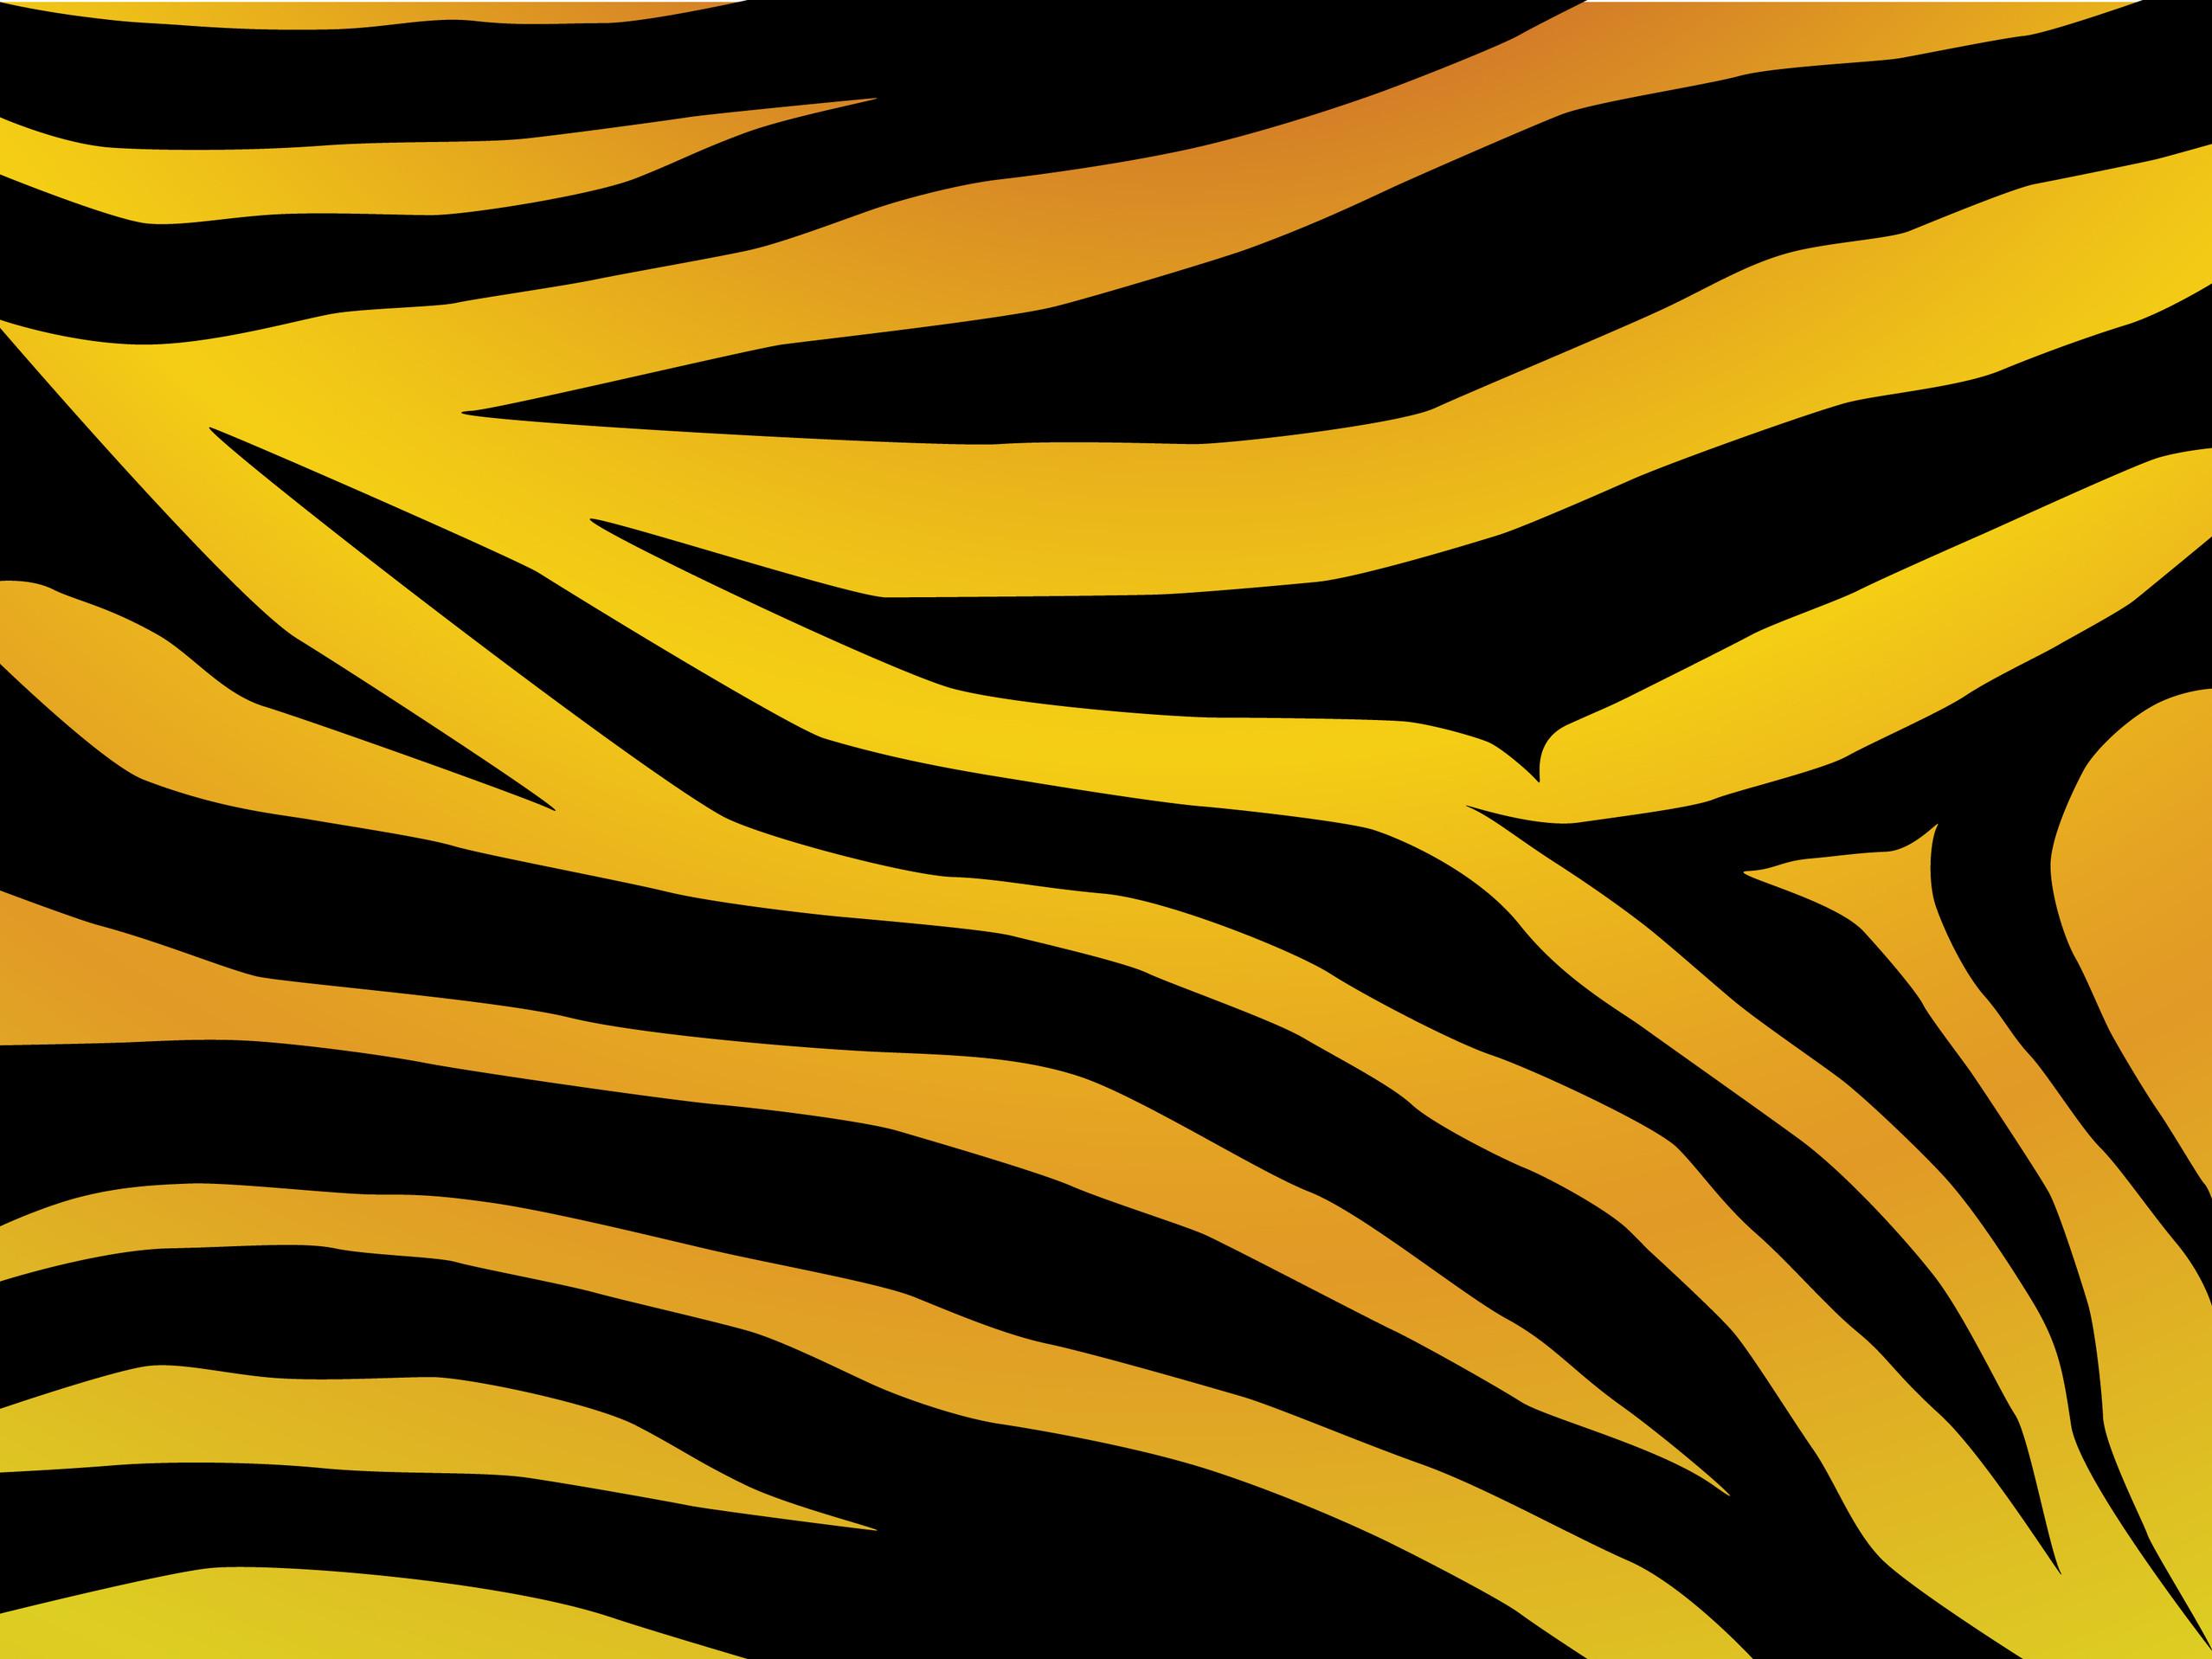 Gold zebra print wallpapers hd desktop wallpapers 4k hd for Zebra print wallpaper